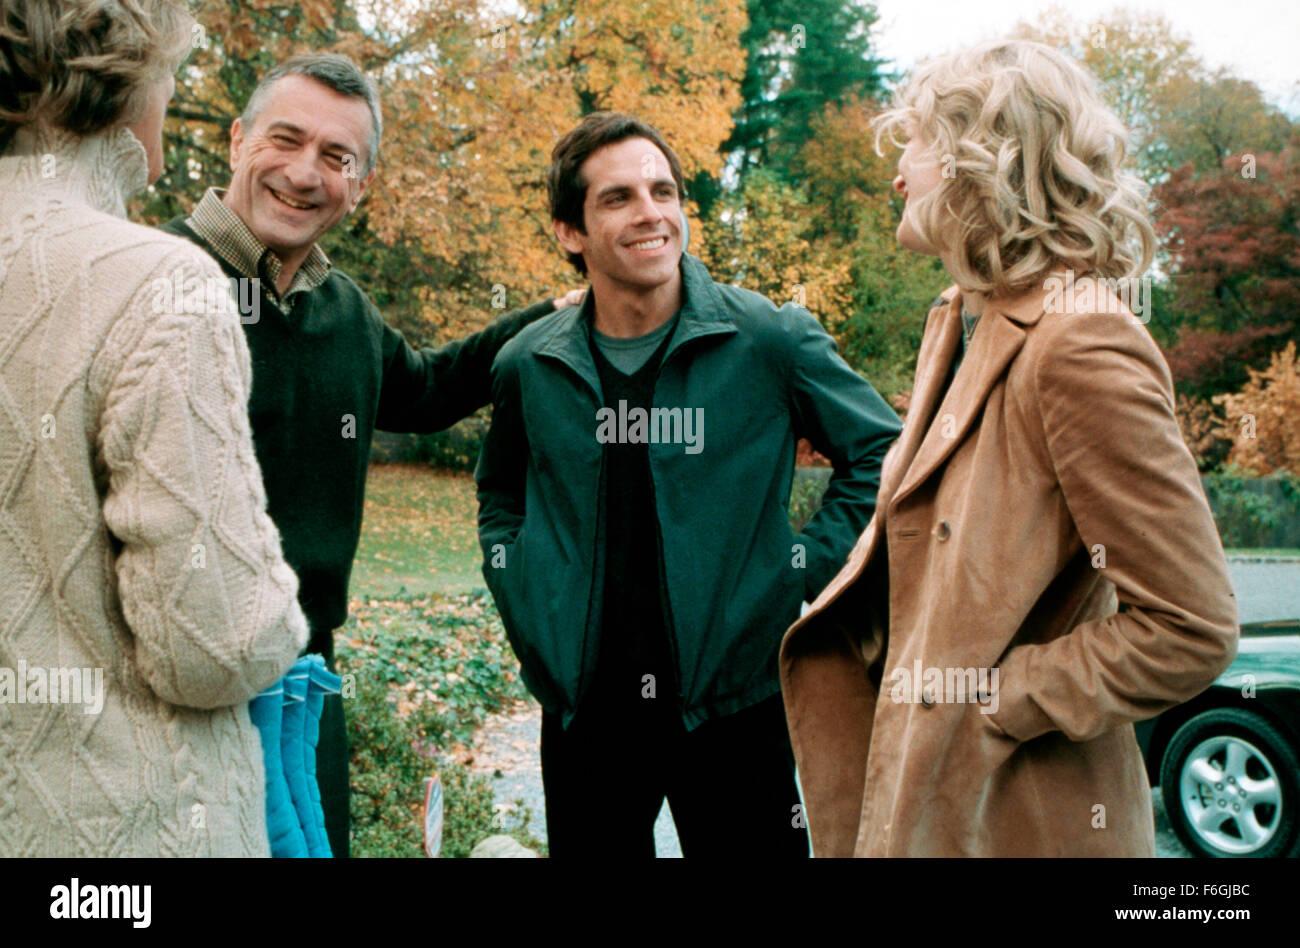 Mar 07, 2000; Hollywood, CA, USA; ROBERT DE NIRO, BEN STILLER and TERI POLO star as Jack Byrnes, Greg Focker and - Stock Image